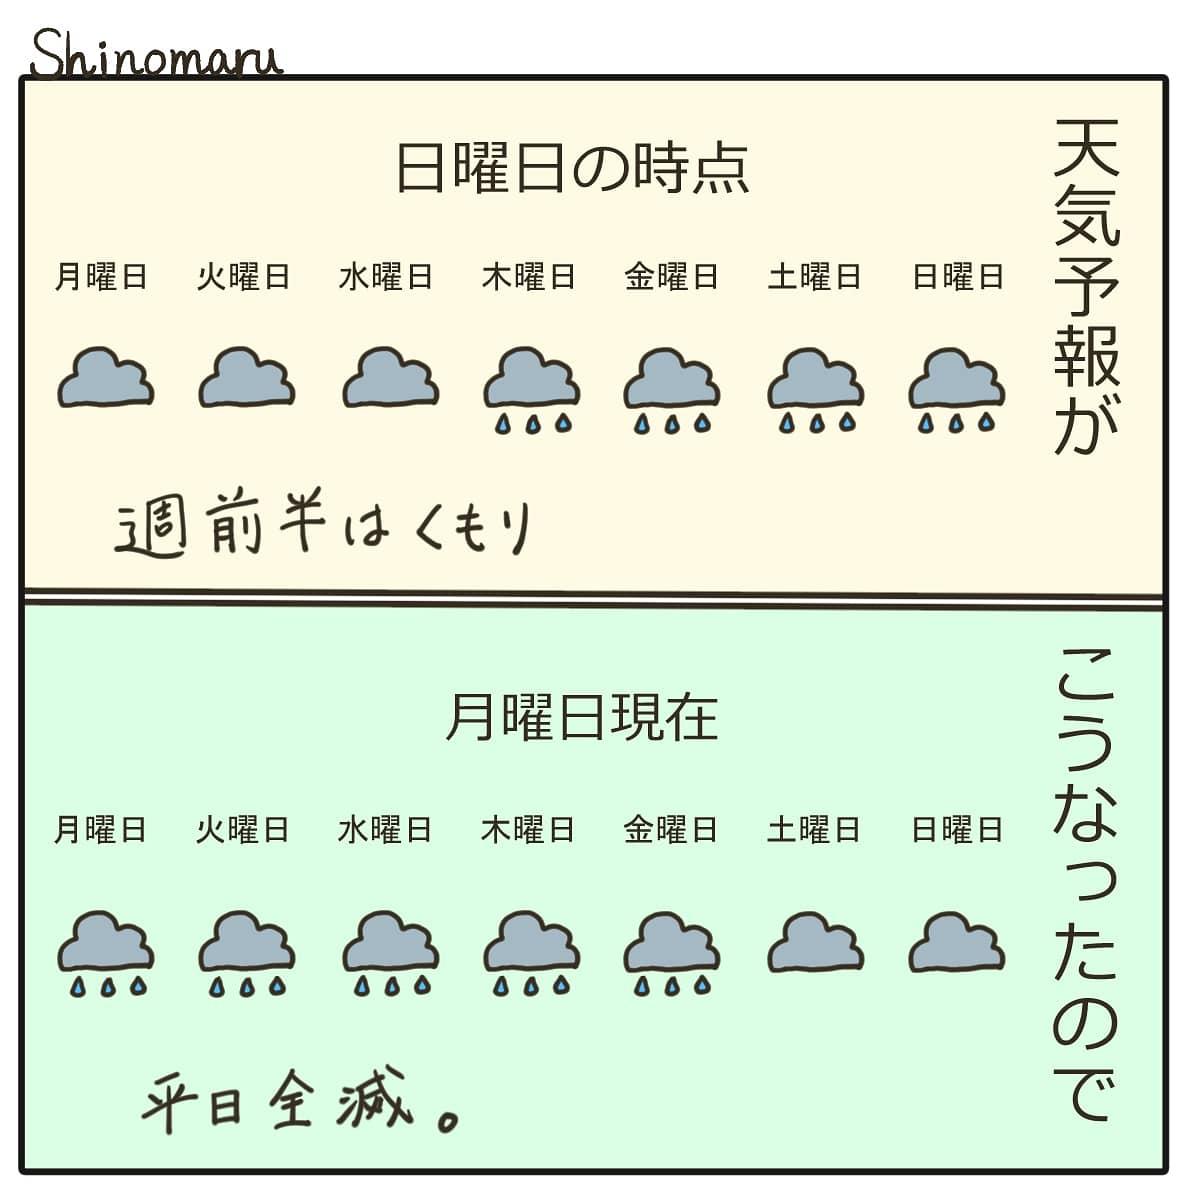 f:id:Shinomaru:20210517185700j:plain